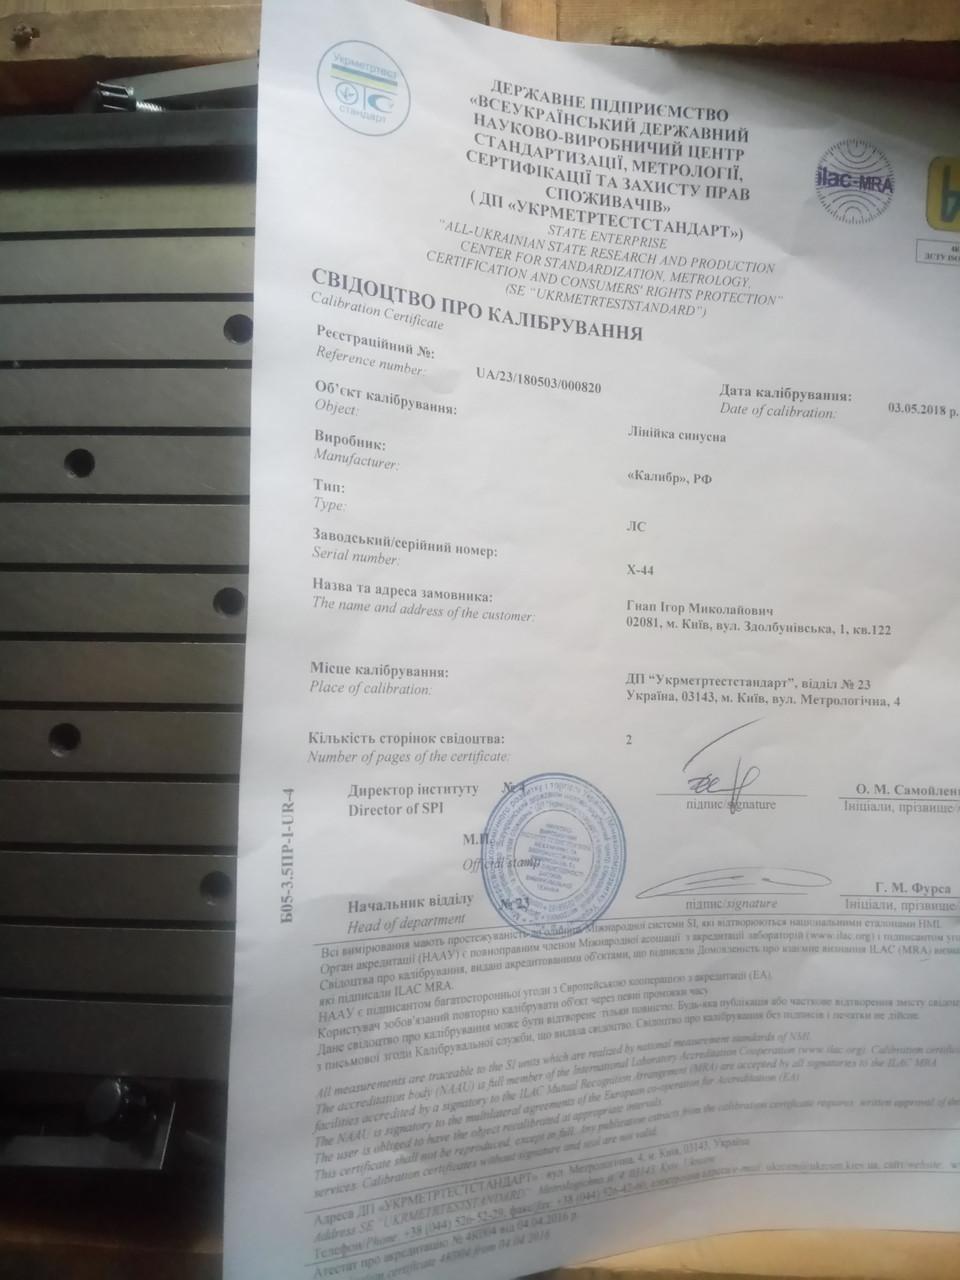 Синусная линейка 200х120 тип ЛС (ГОСТ 4046-80) мод.136 с калибровкой в  УкрЦСМ  № Х-44